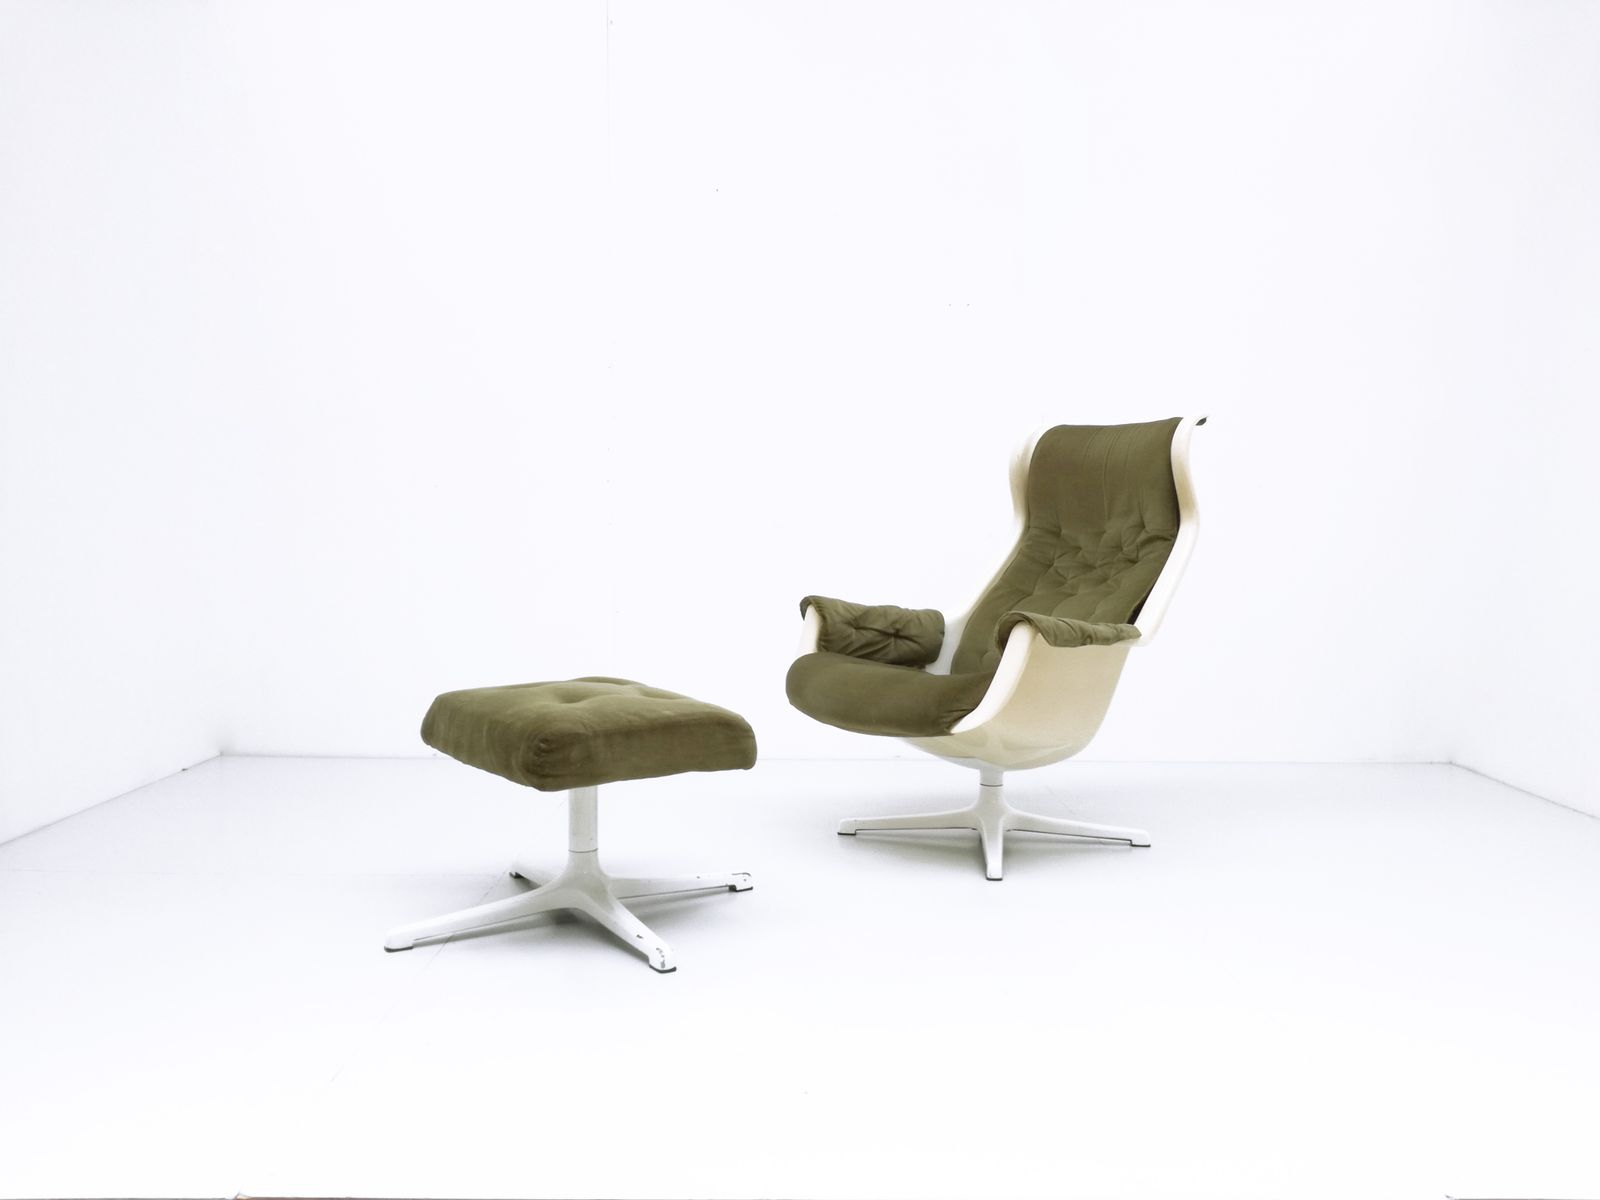 Vintage Galaxy Chair & Ottoman by Alf Svensson & Yngve Sanström